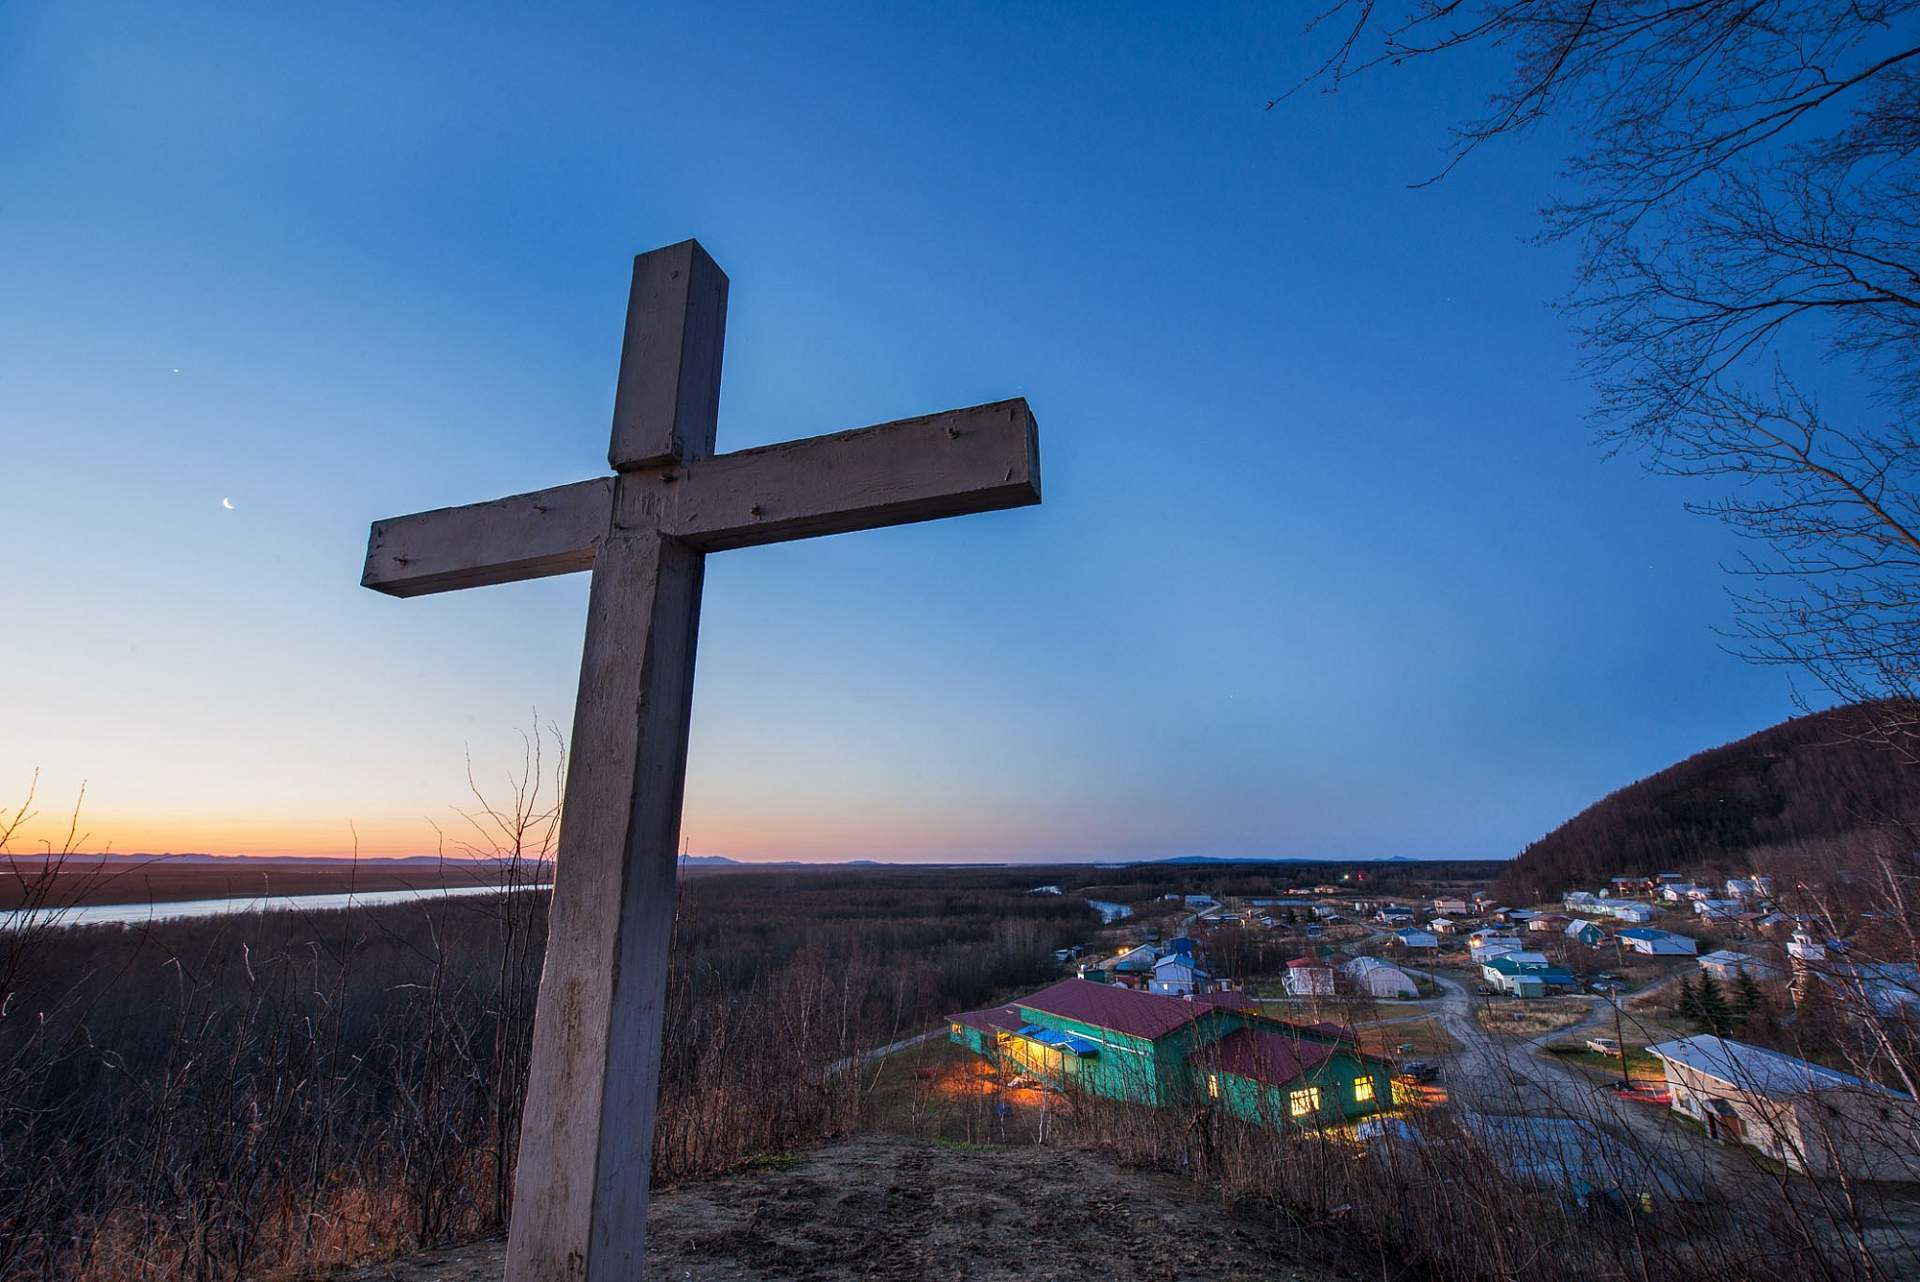 Carl Johnson Holy Cross 1012 HOCR AK 1165 Edit